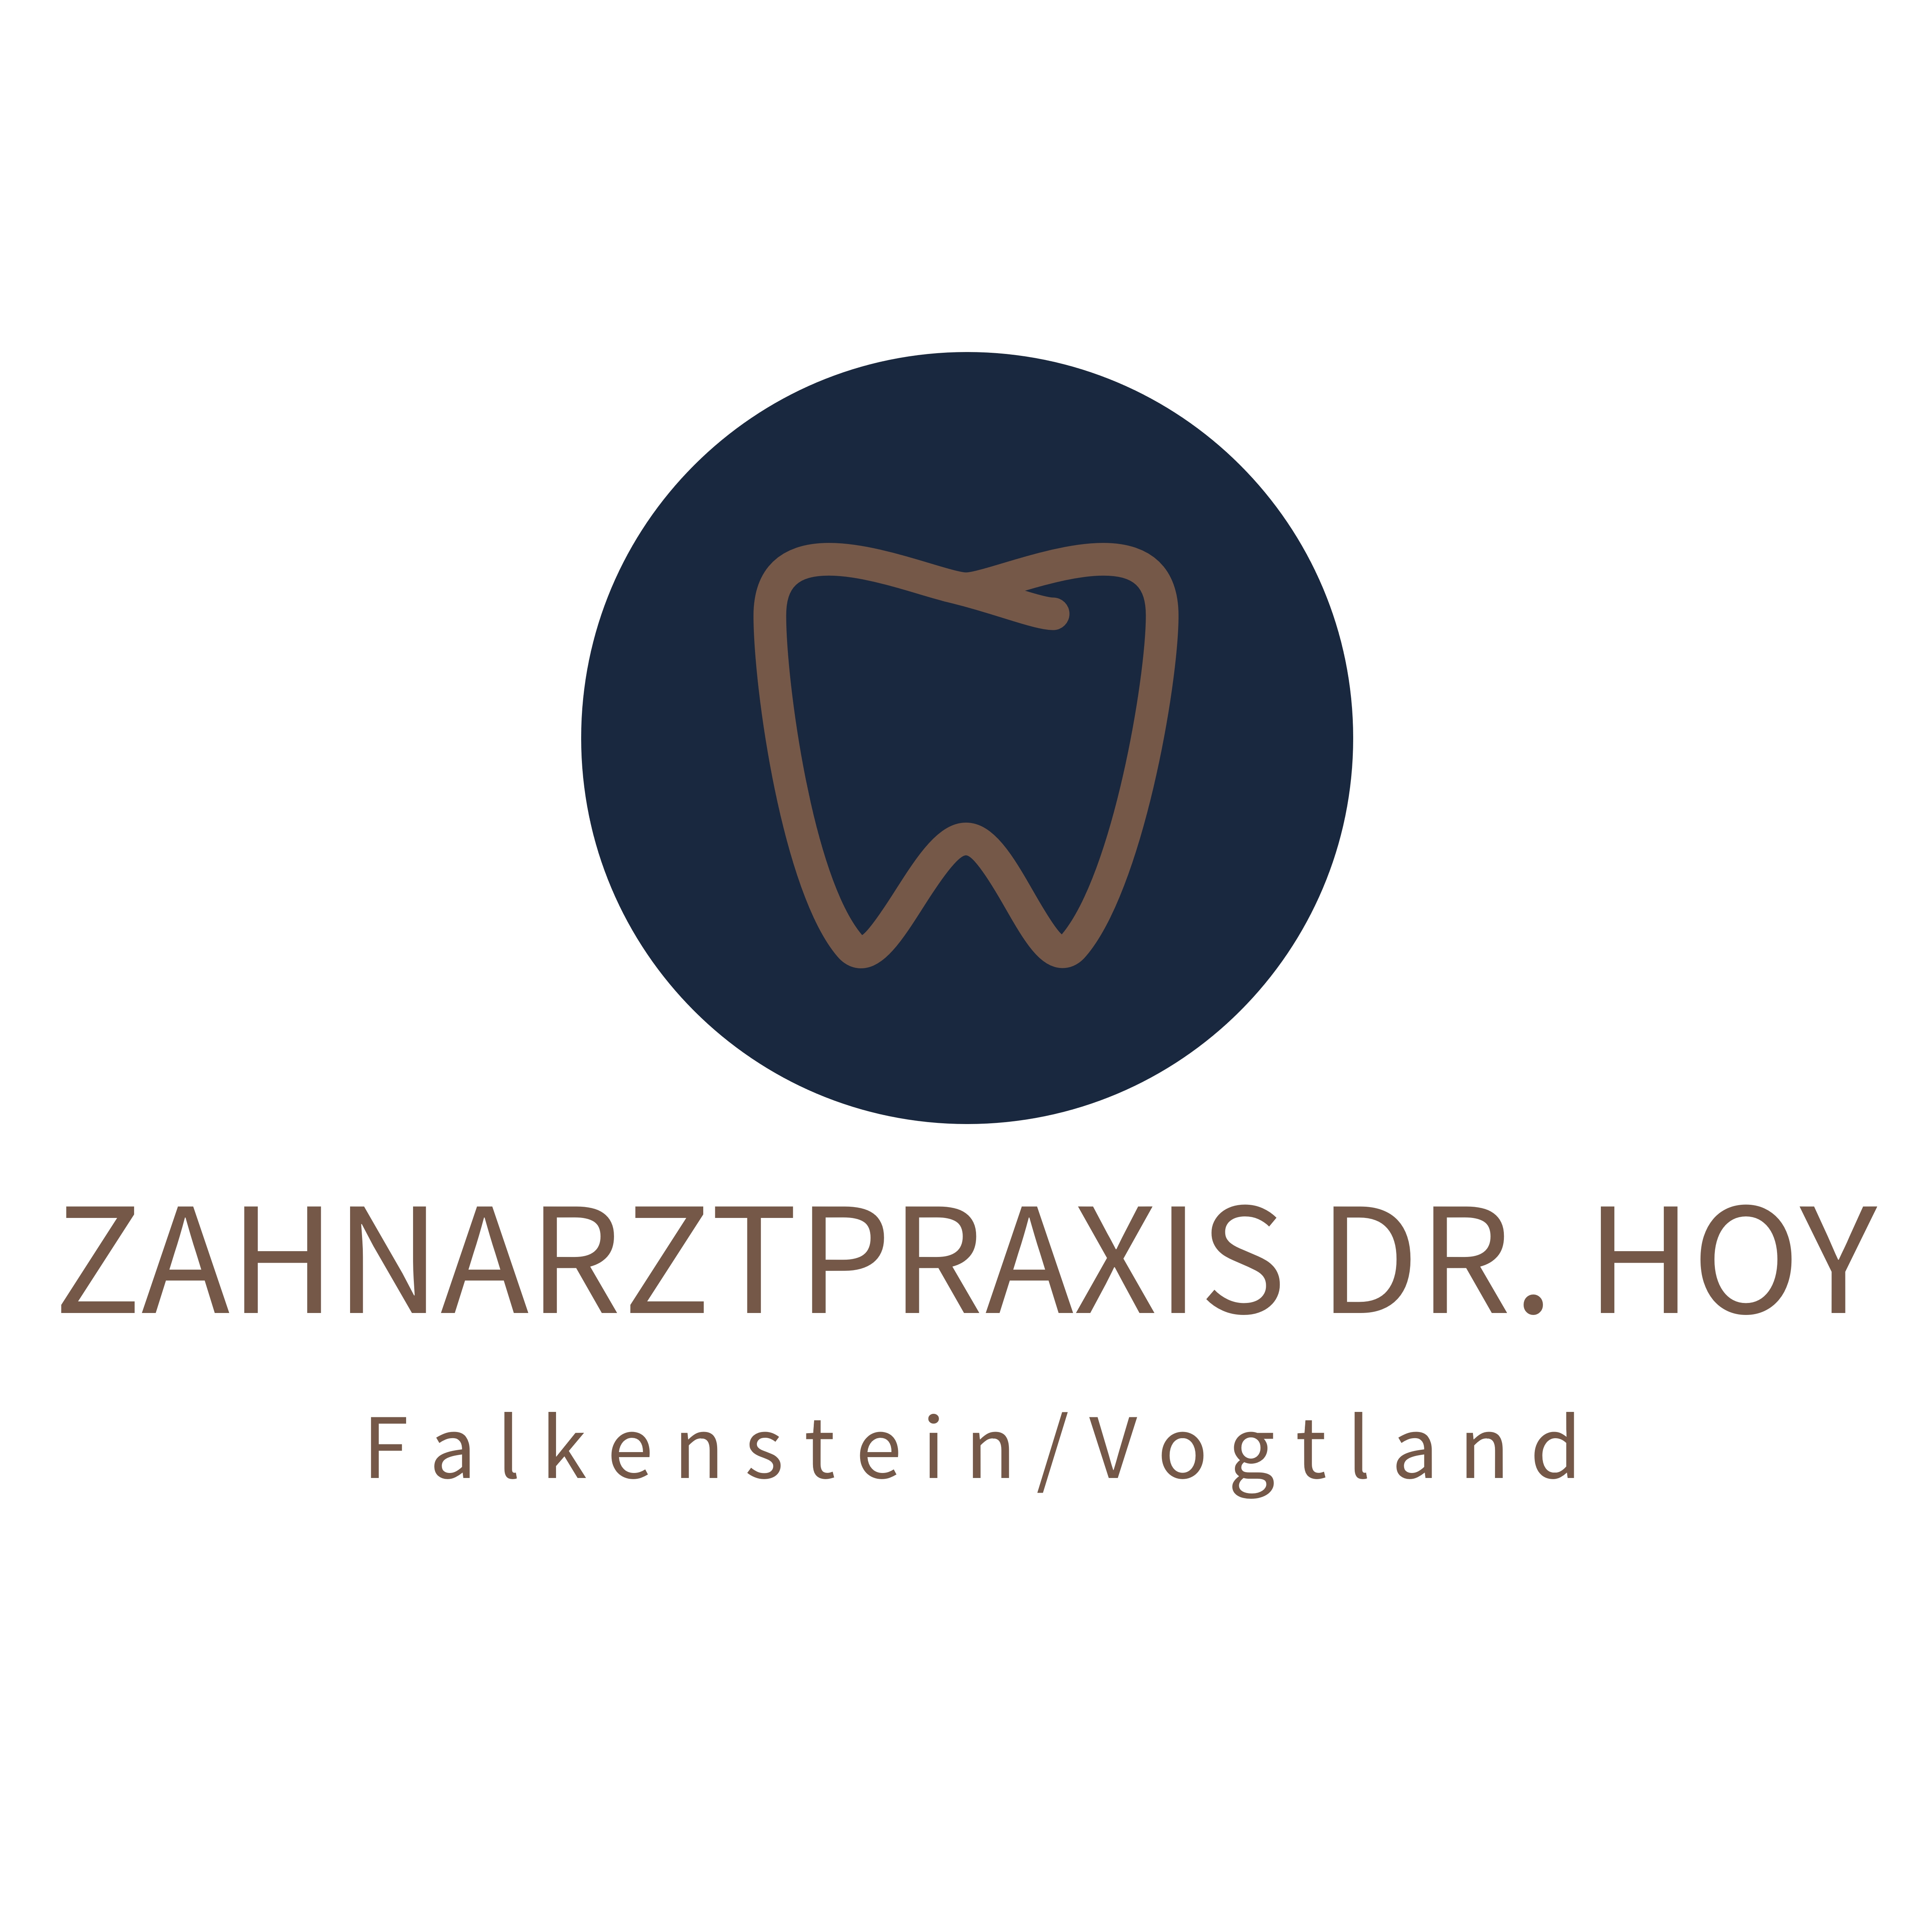 Zahnarztpraxis Dr. Hoy